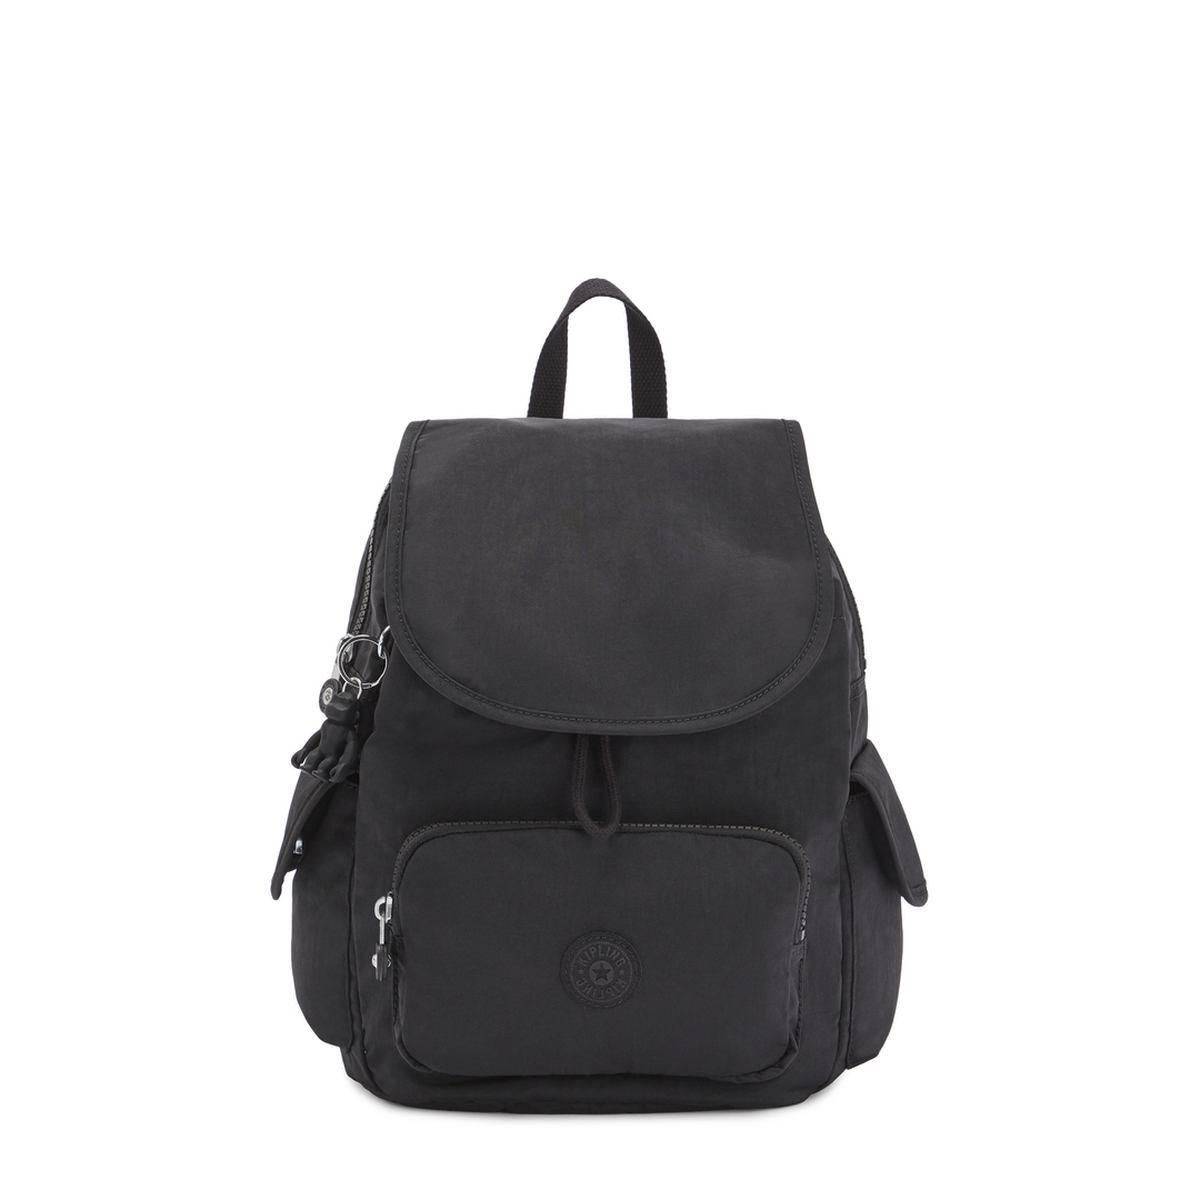 Kipling Τσάντα πλάτης 33.5x27x19cm City Packs S Fresh Black